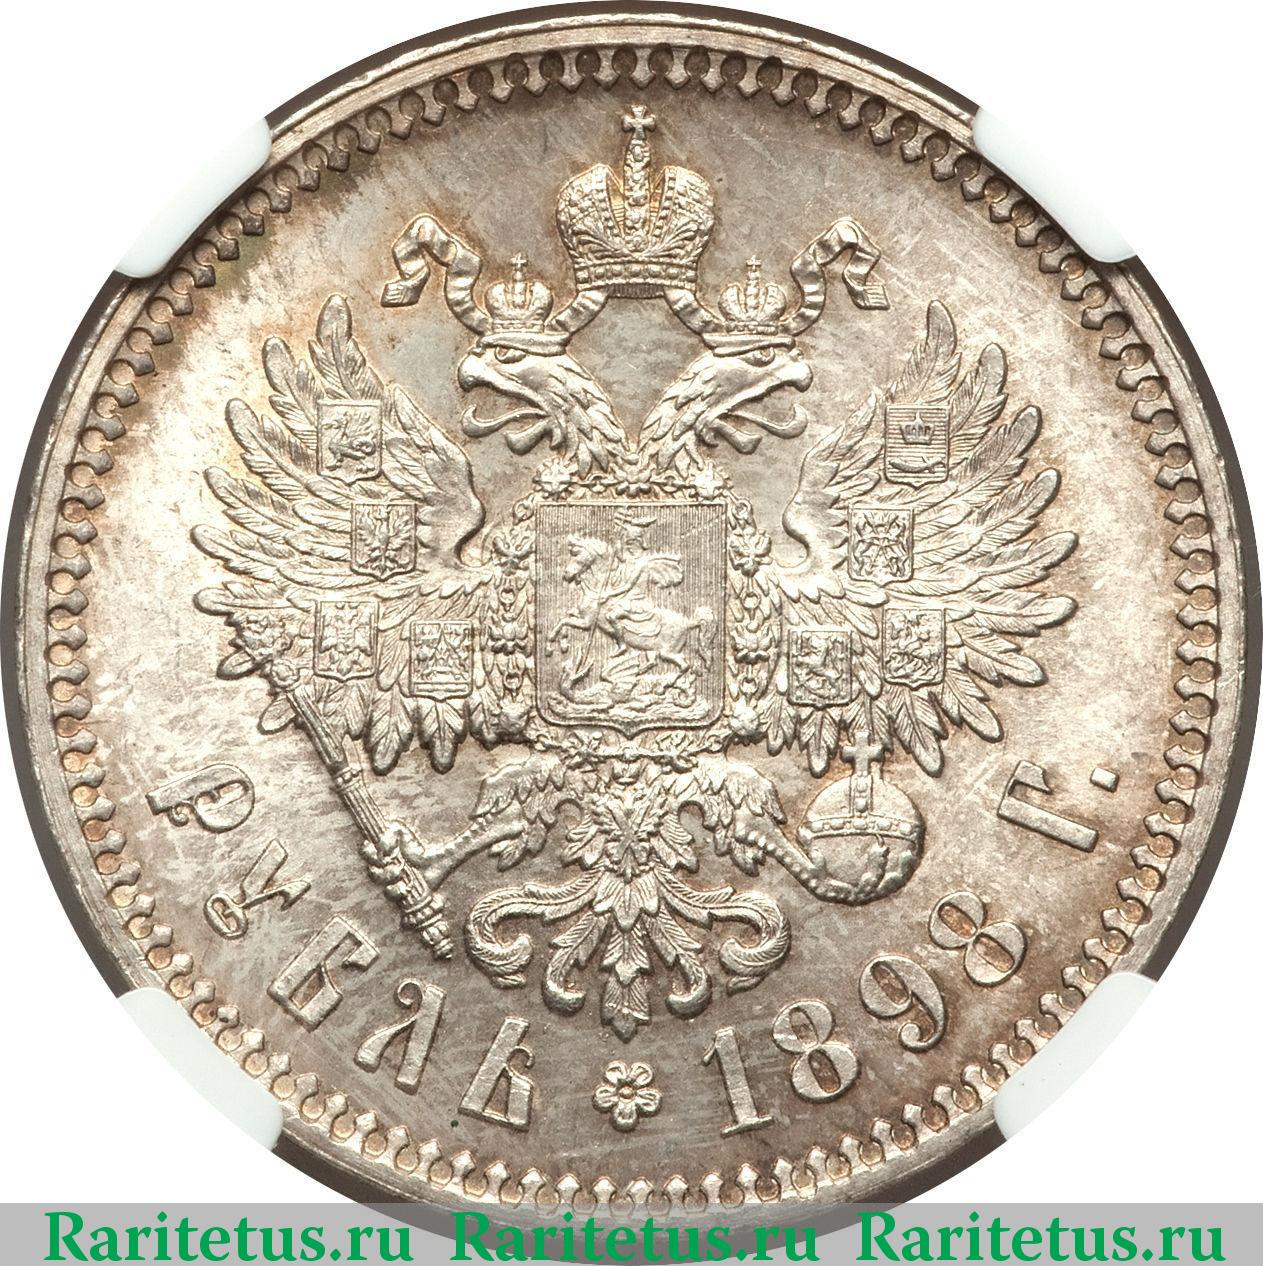 Купить серебряную монету музей императора александра 25 копеек 1896 года цена серебро